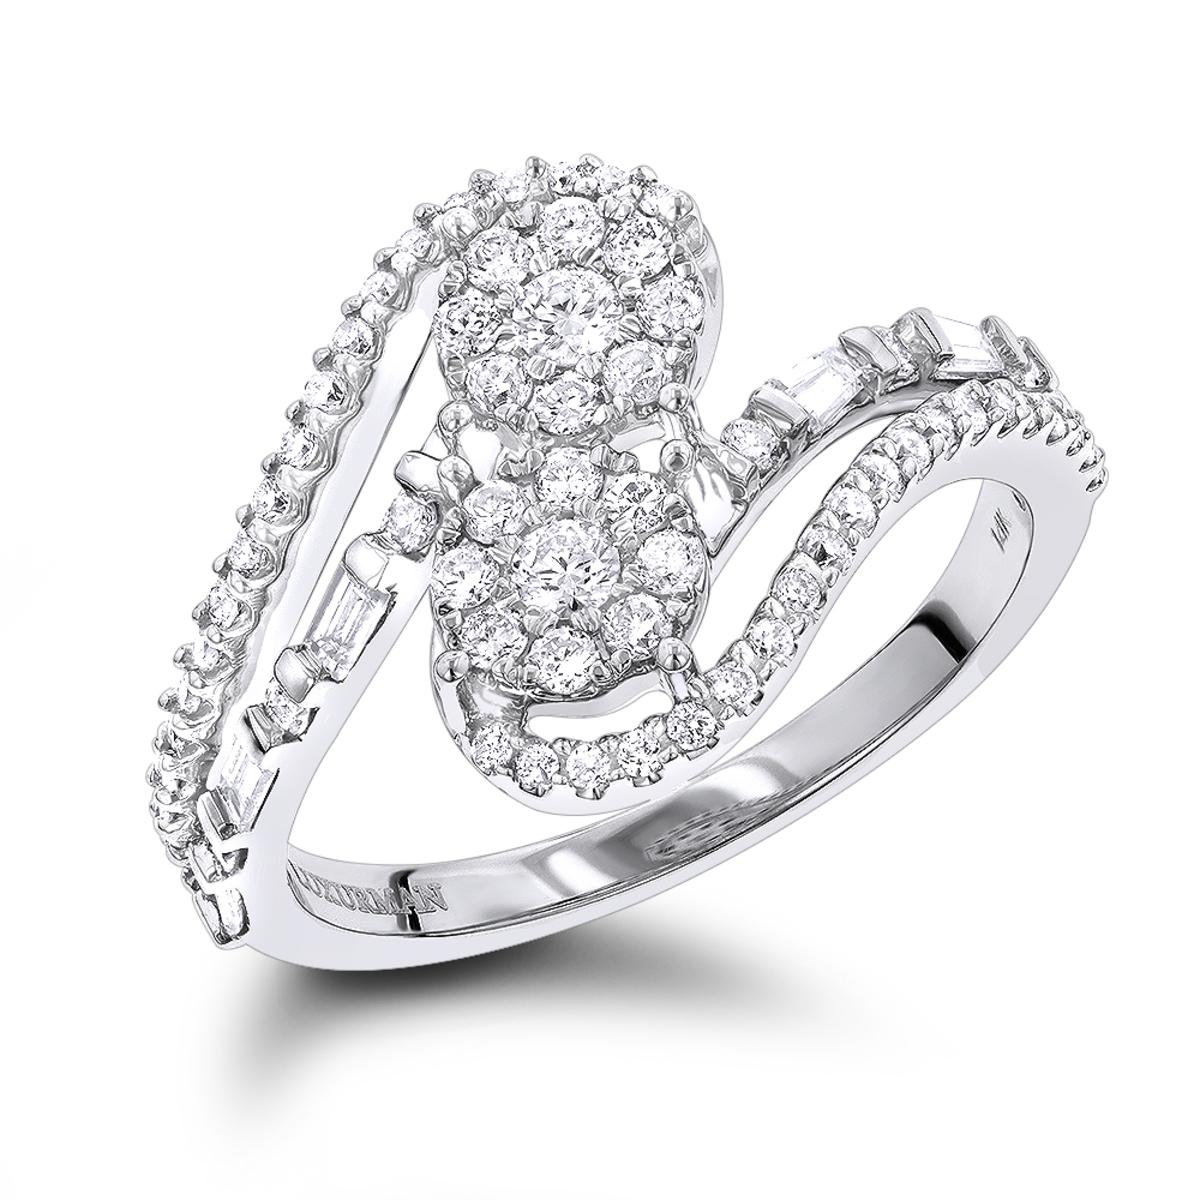 LUXURMAN Unique Womens Diamond Rings: 14K Gold 2 Cluster Diamond Ring 0.8ct